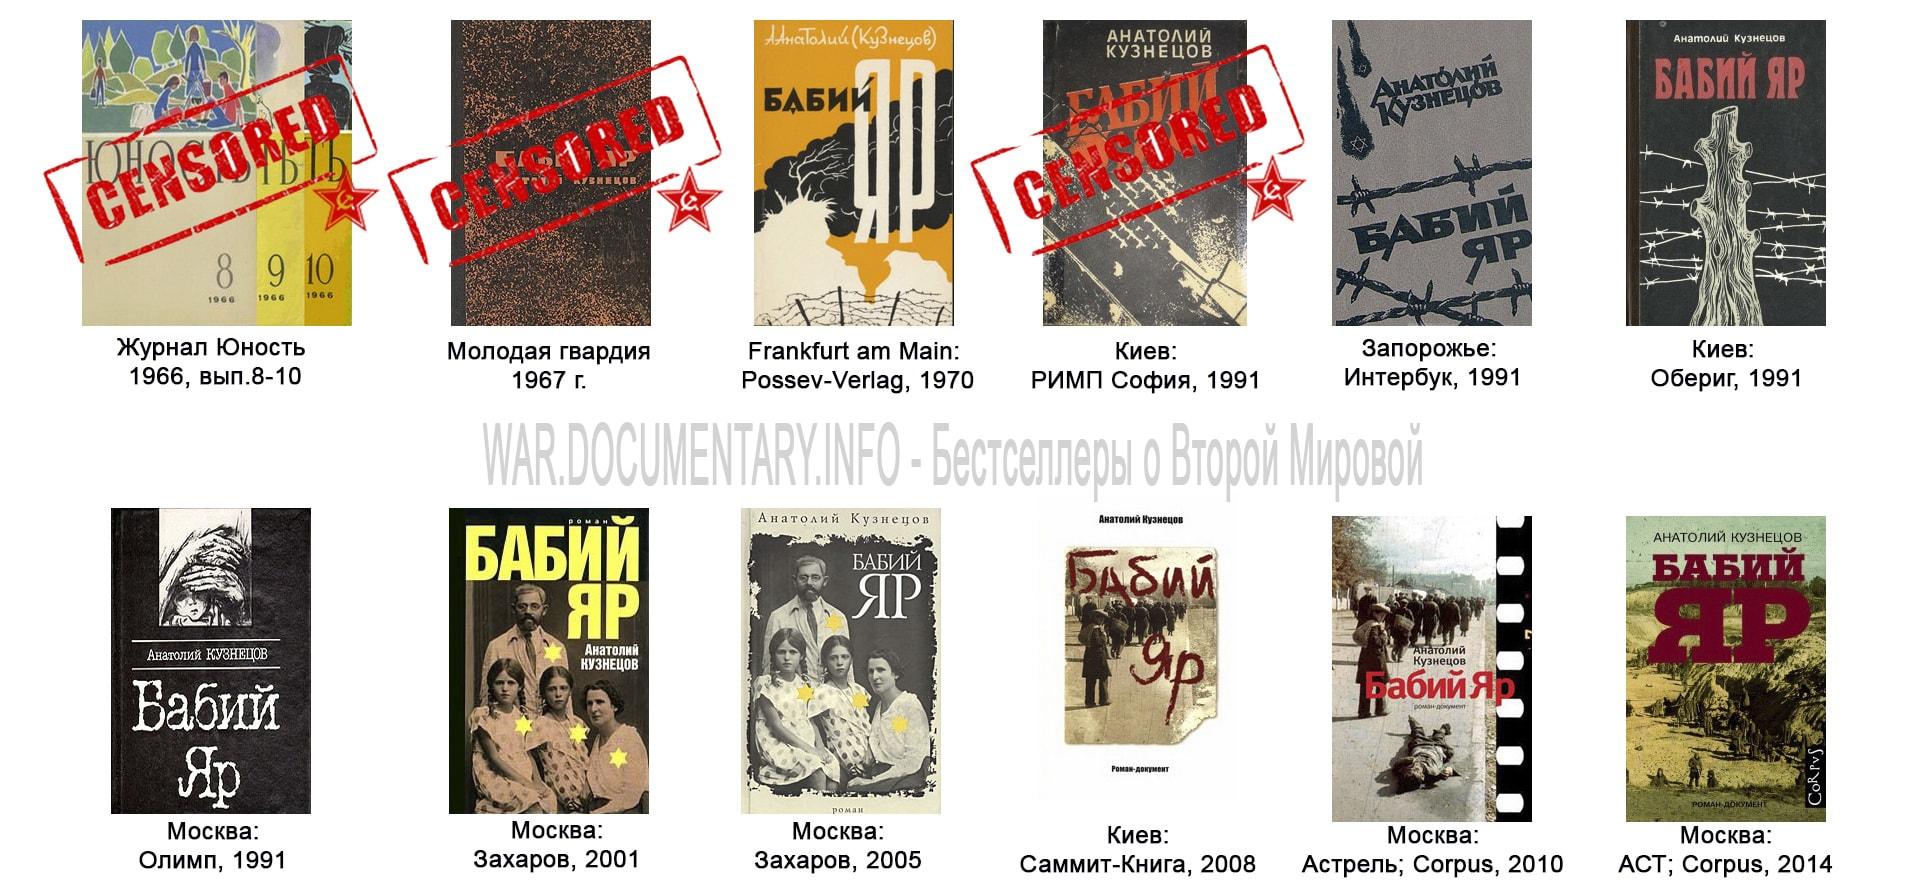 Все издания Бабий яр роман Анатолия Кузнецова